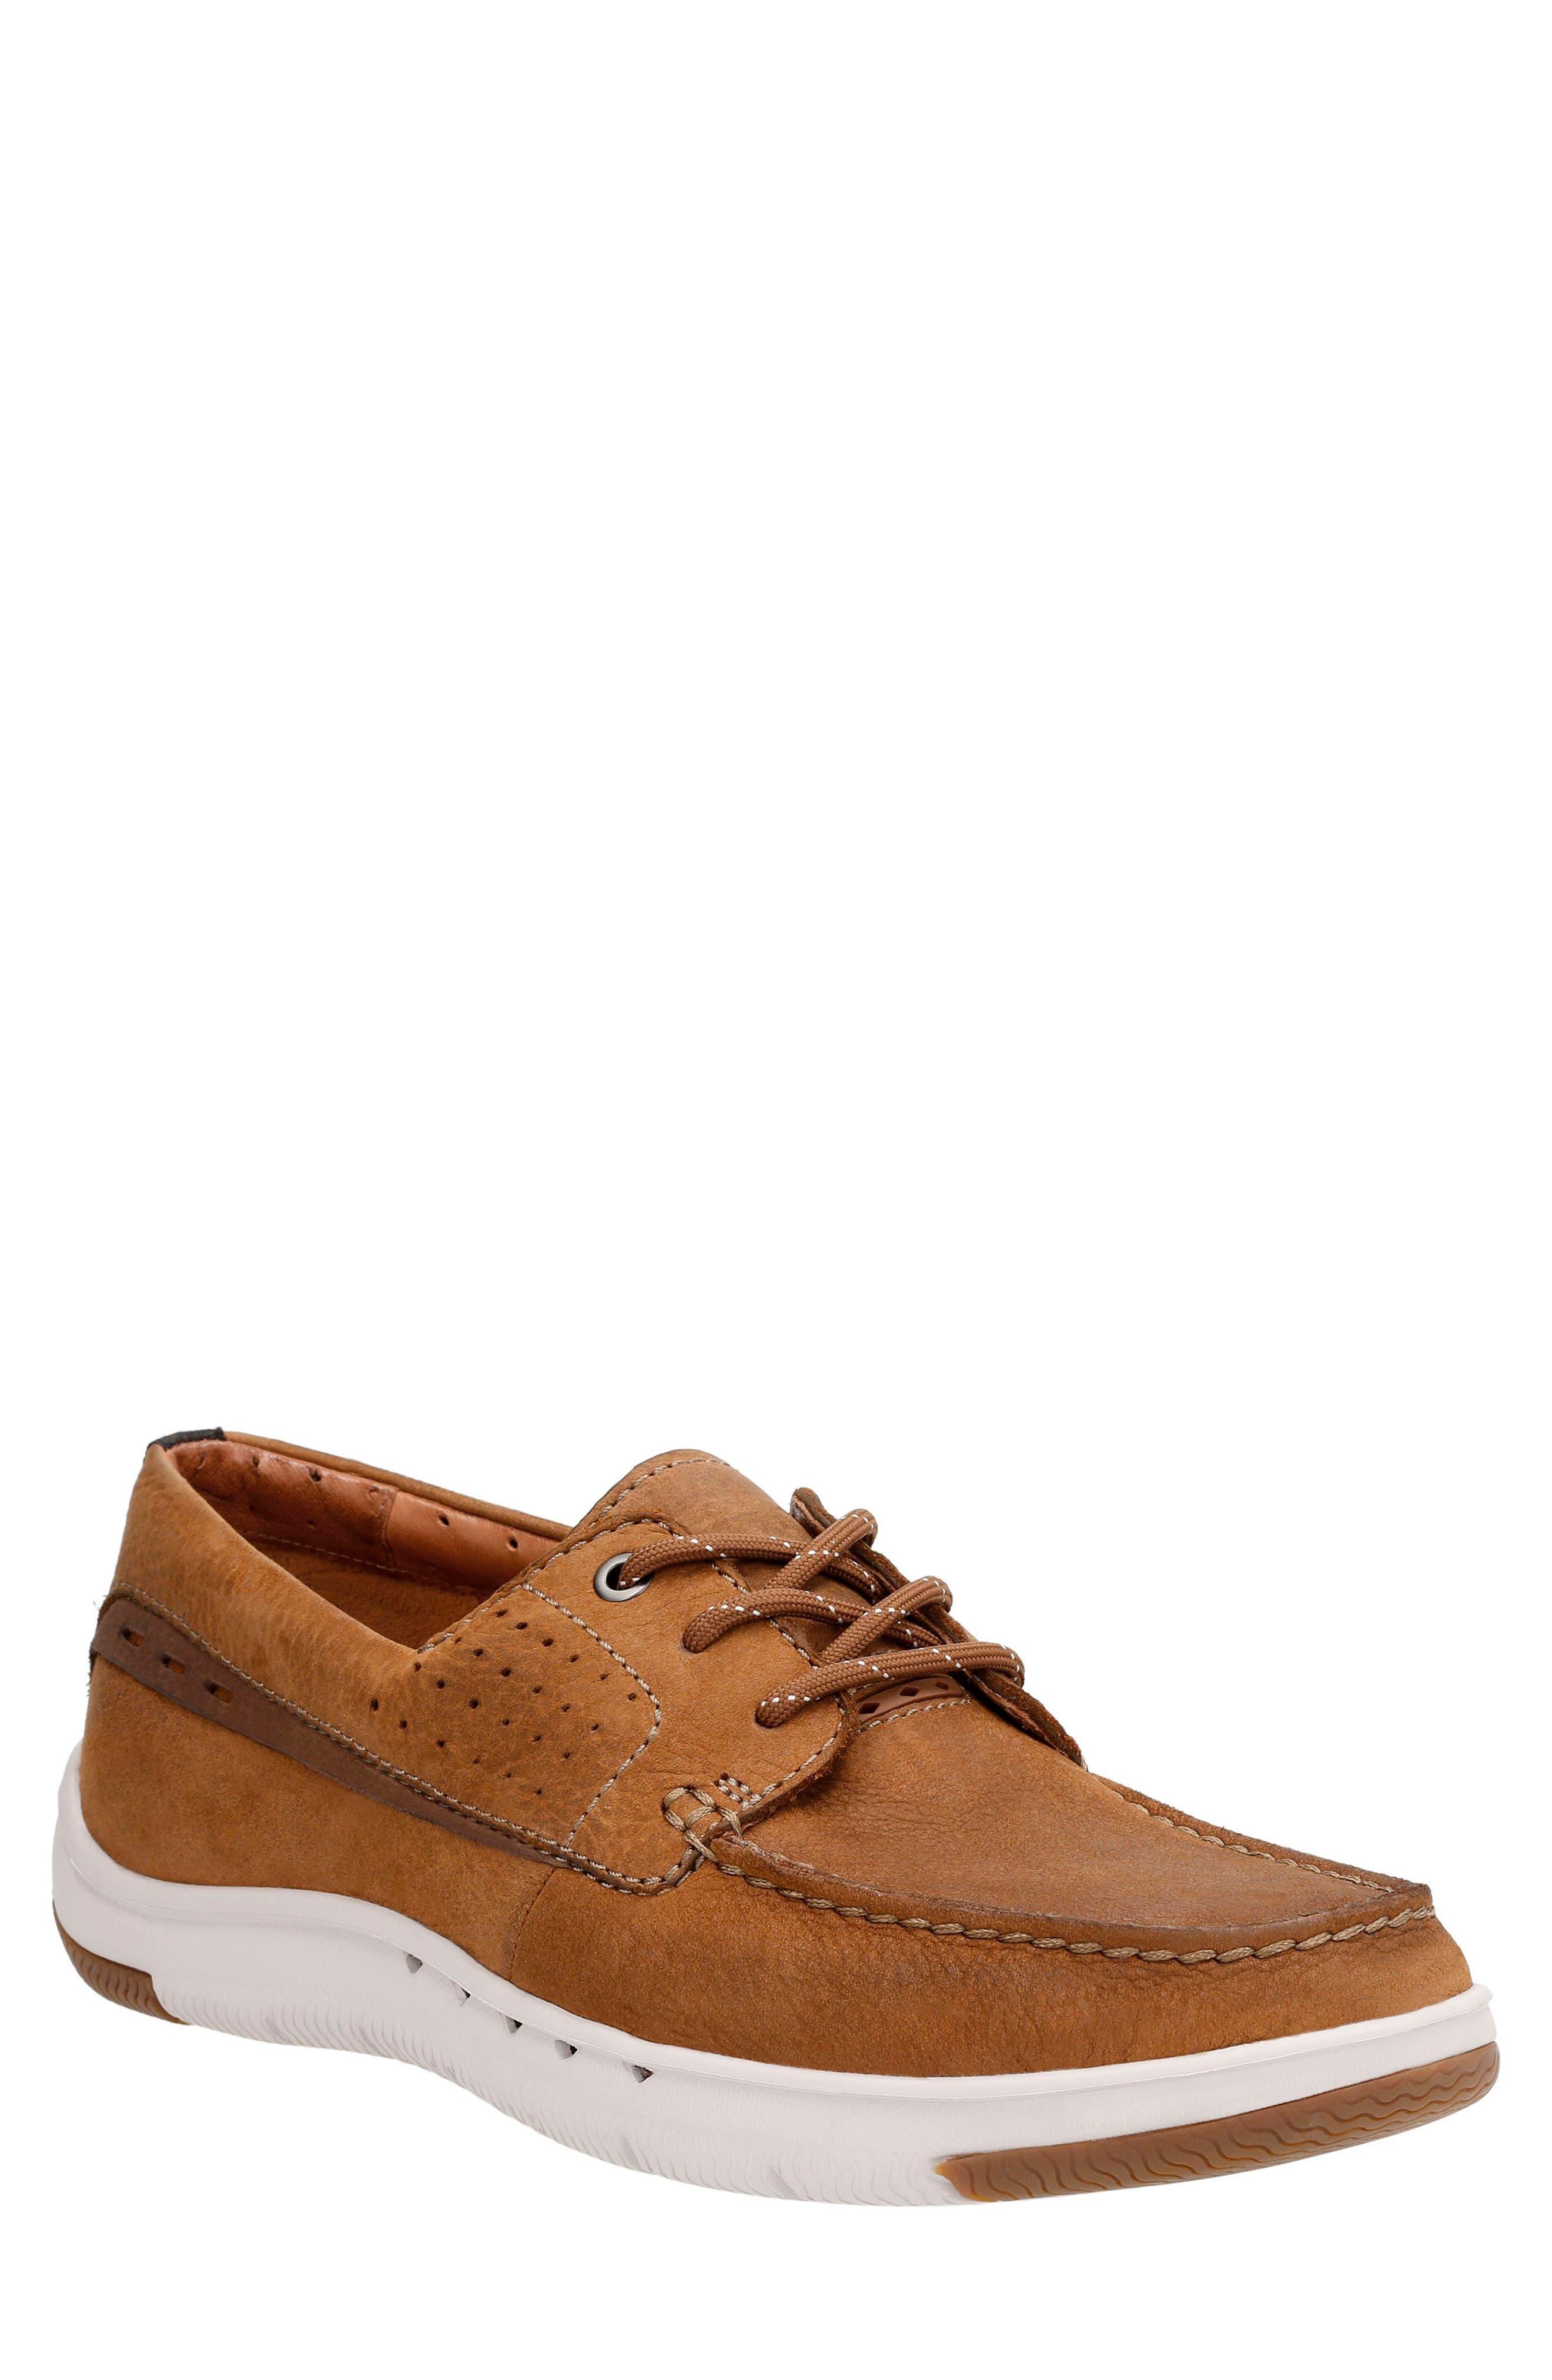 Un.Maslow Sneaker,                         Main,                         color, 200